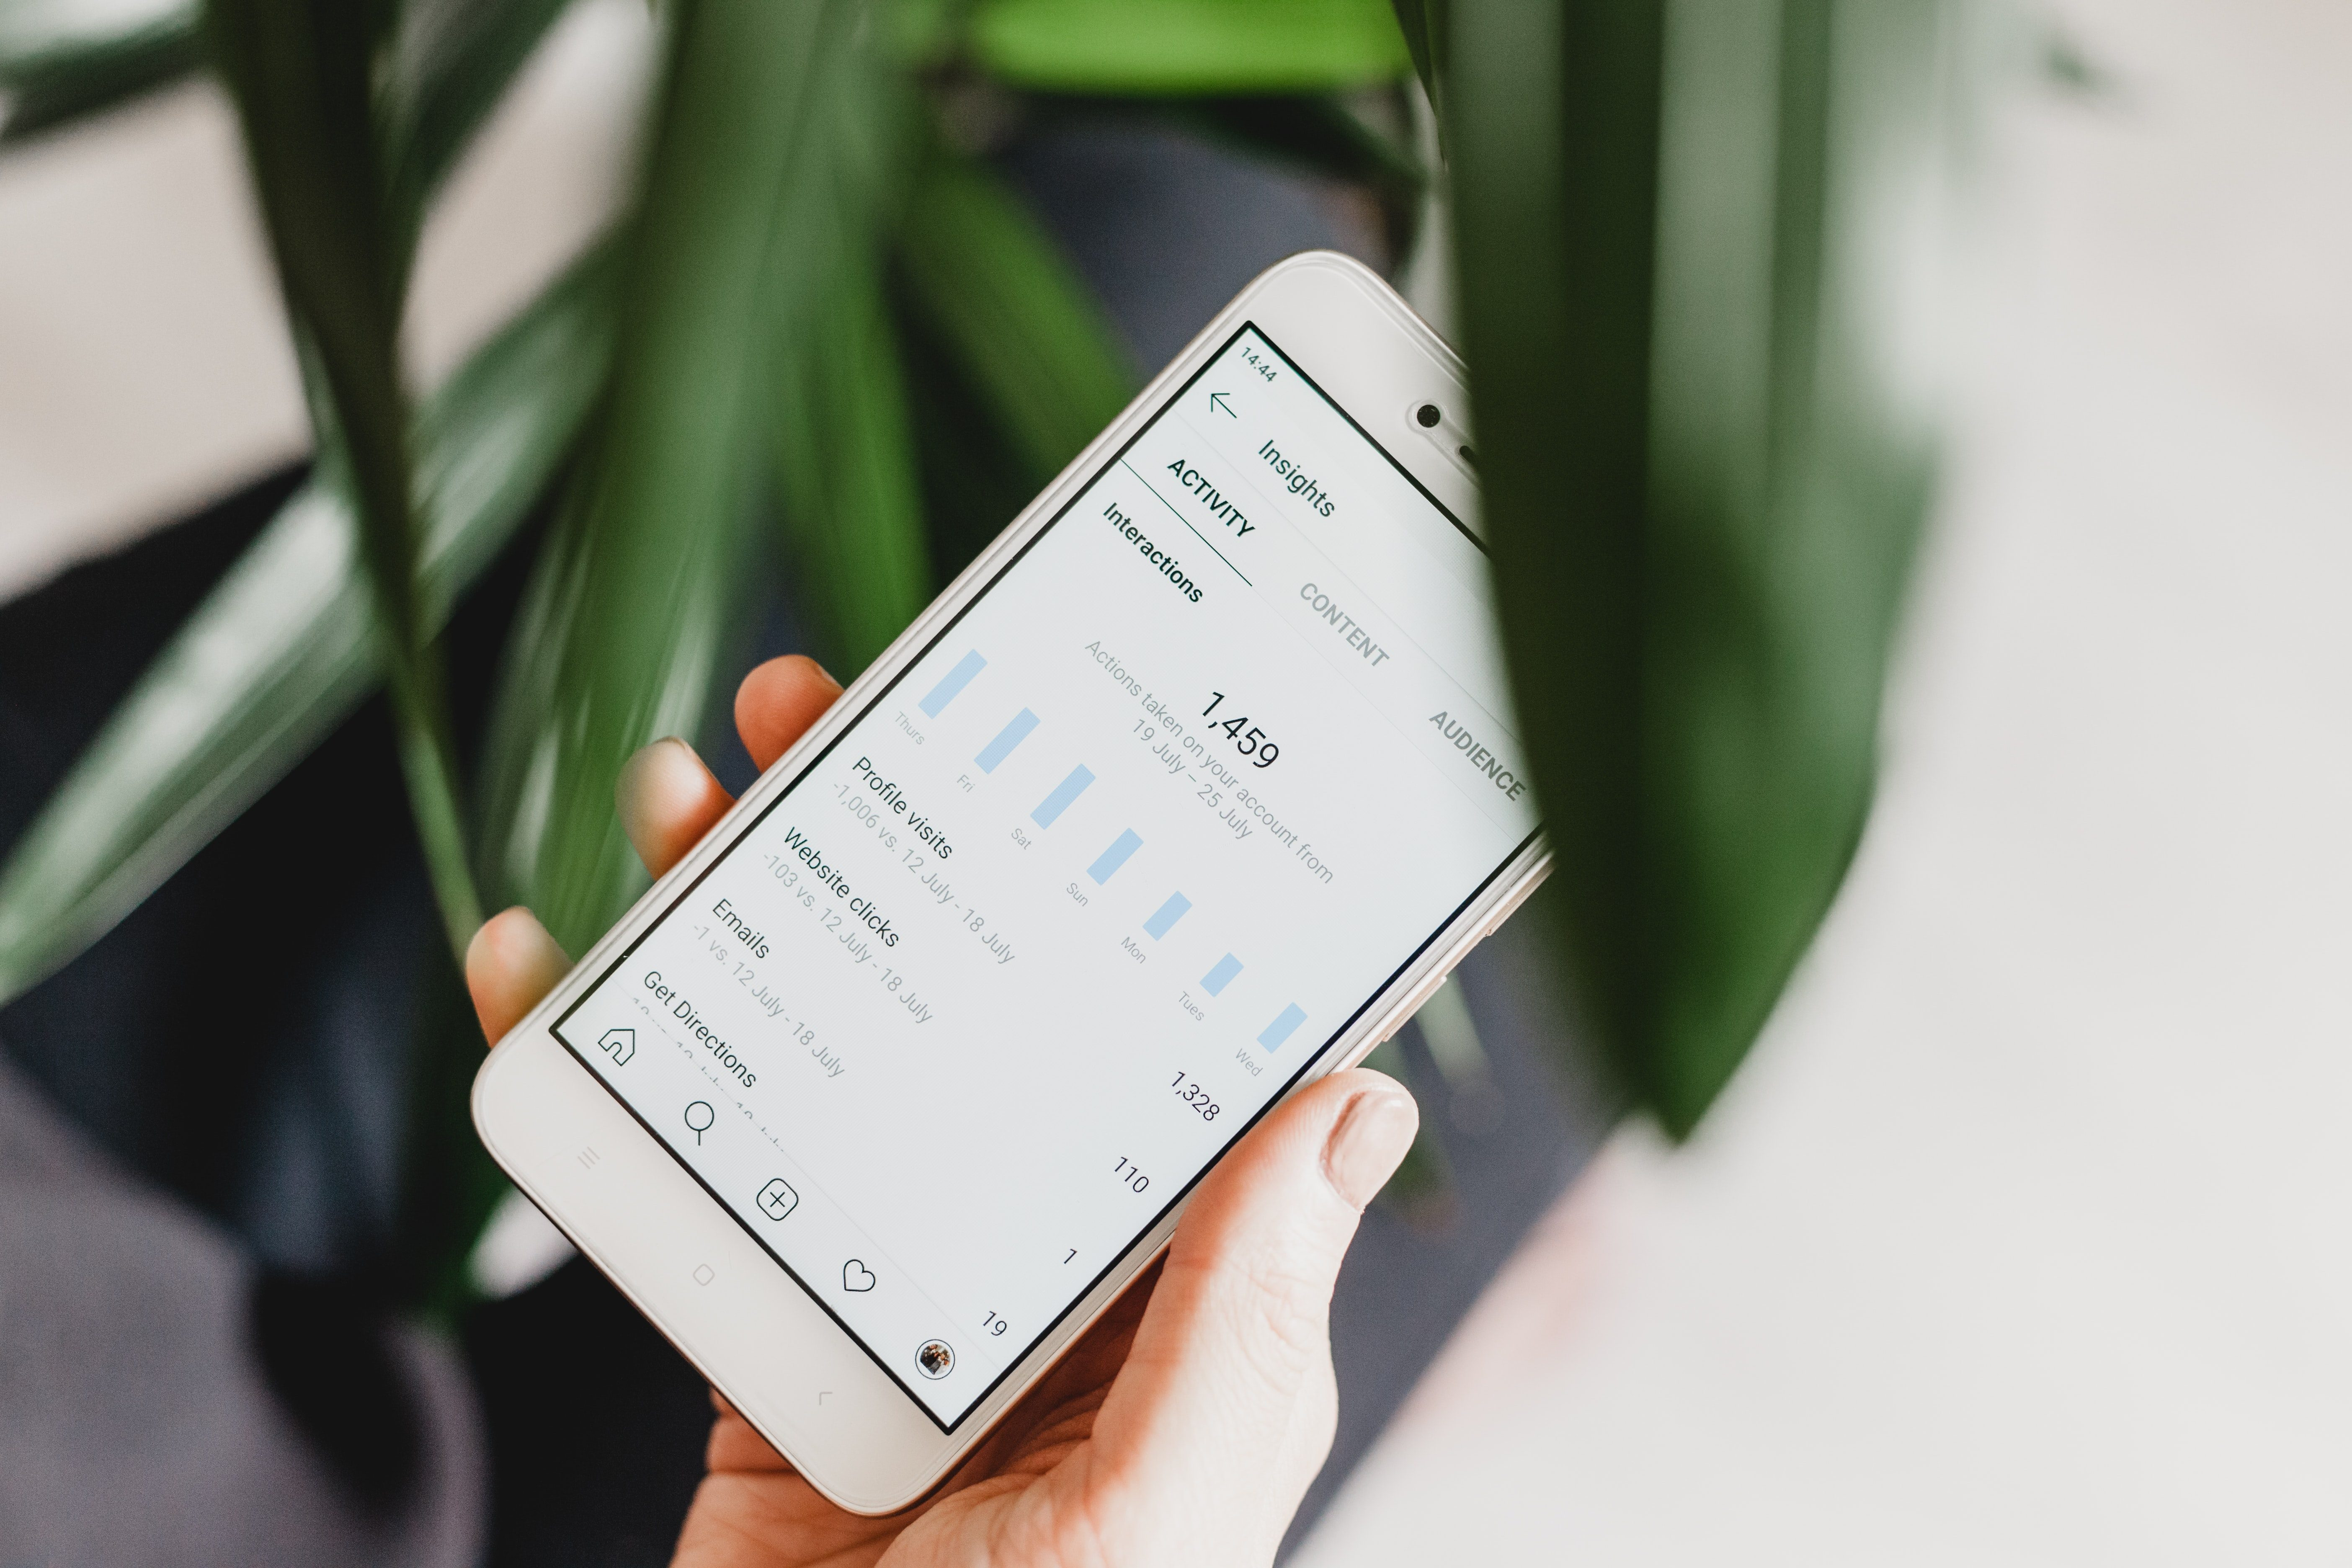 Social media analytics displayed on mobile phone